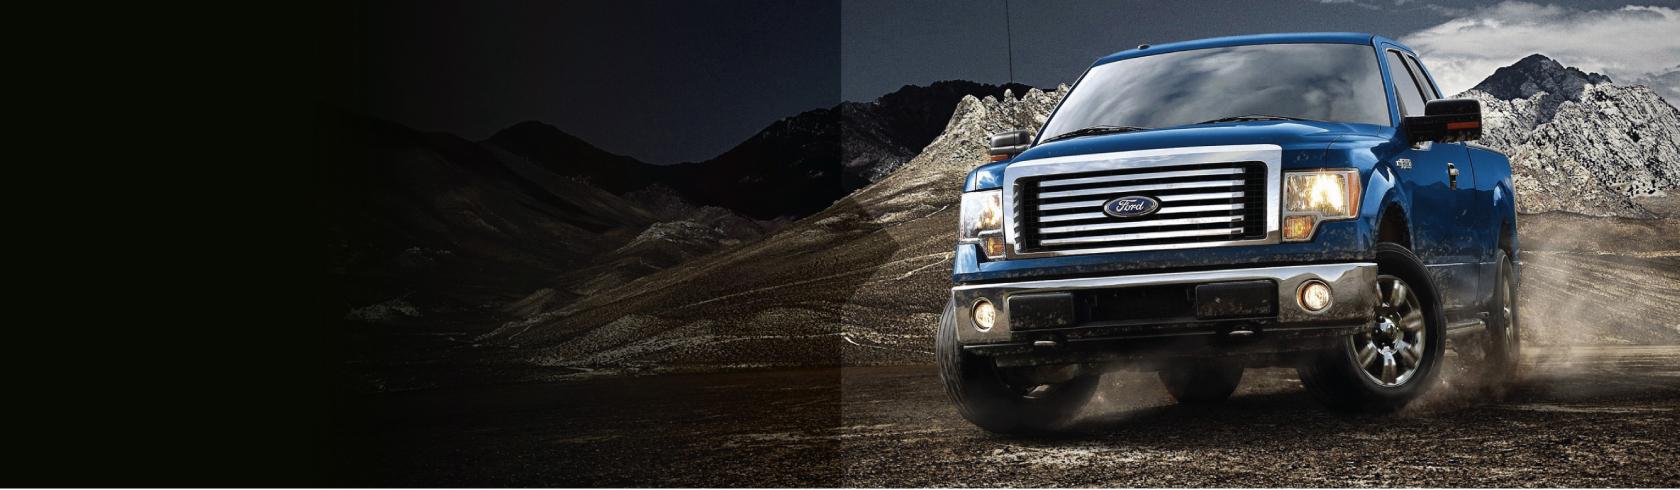 Blue truck driving